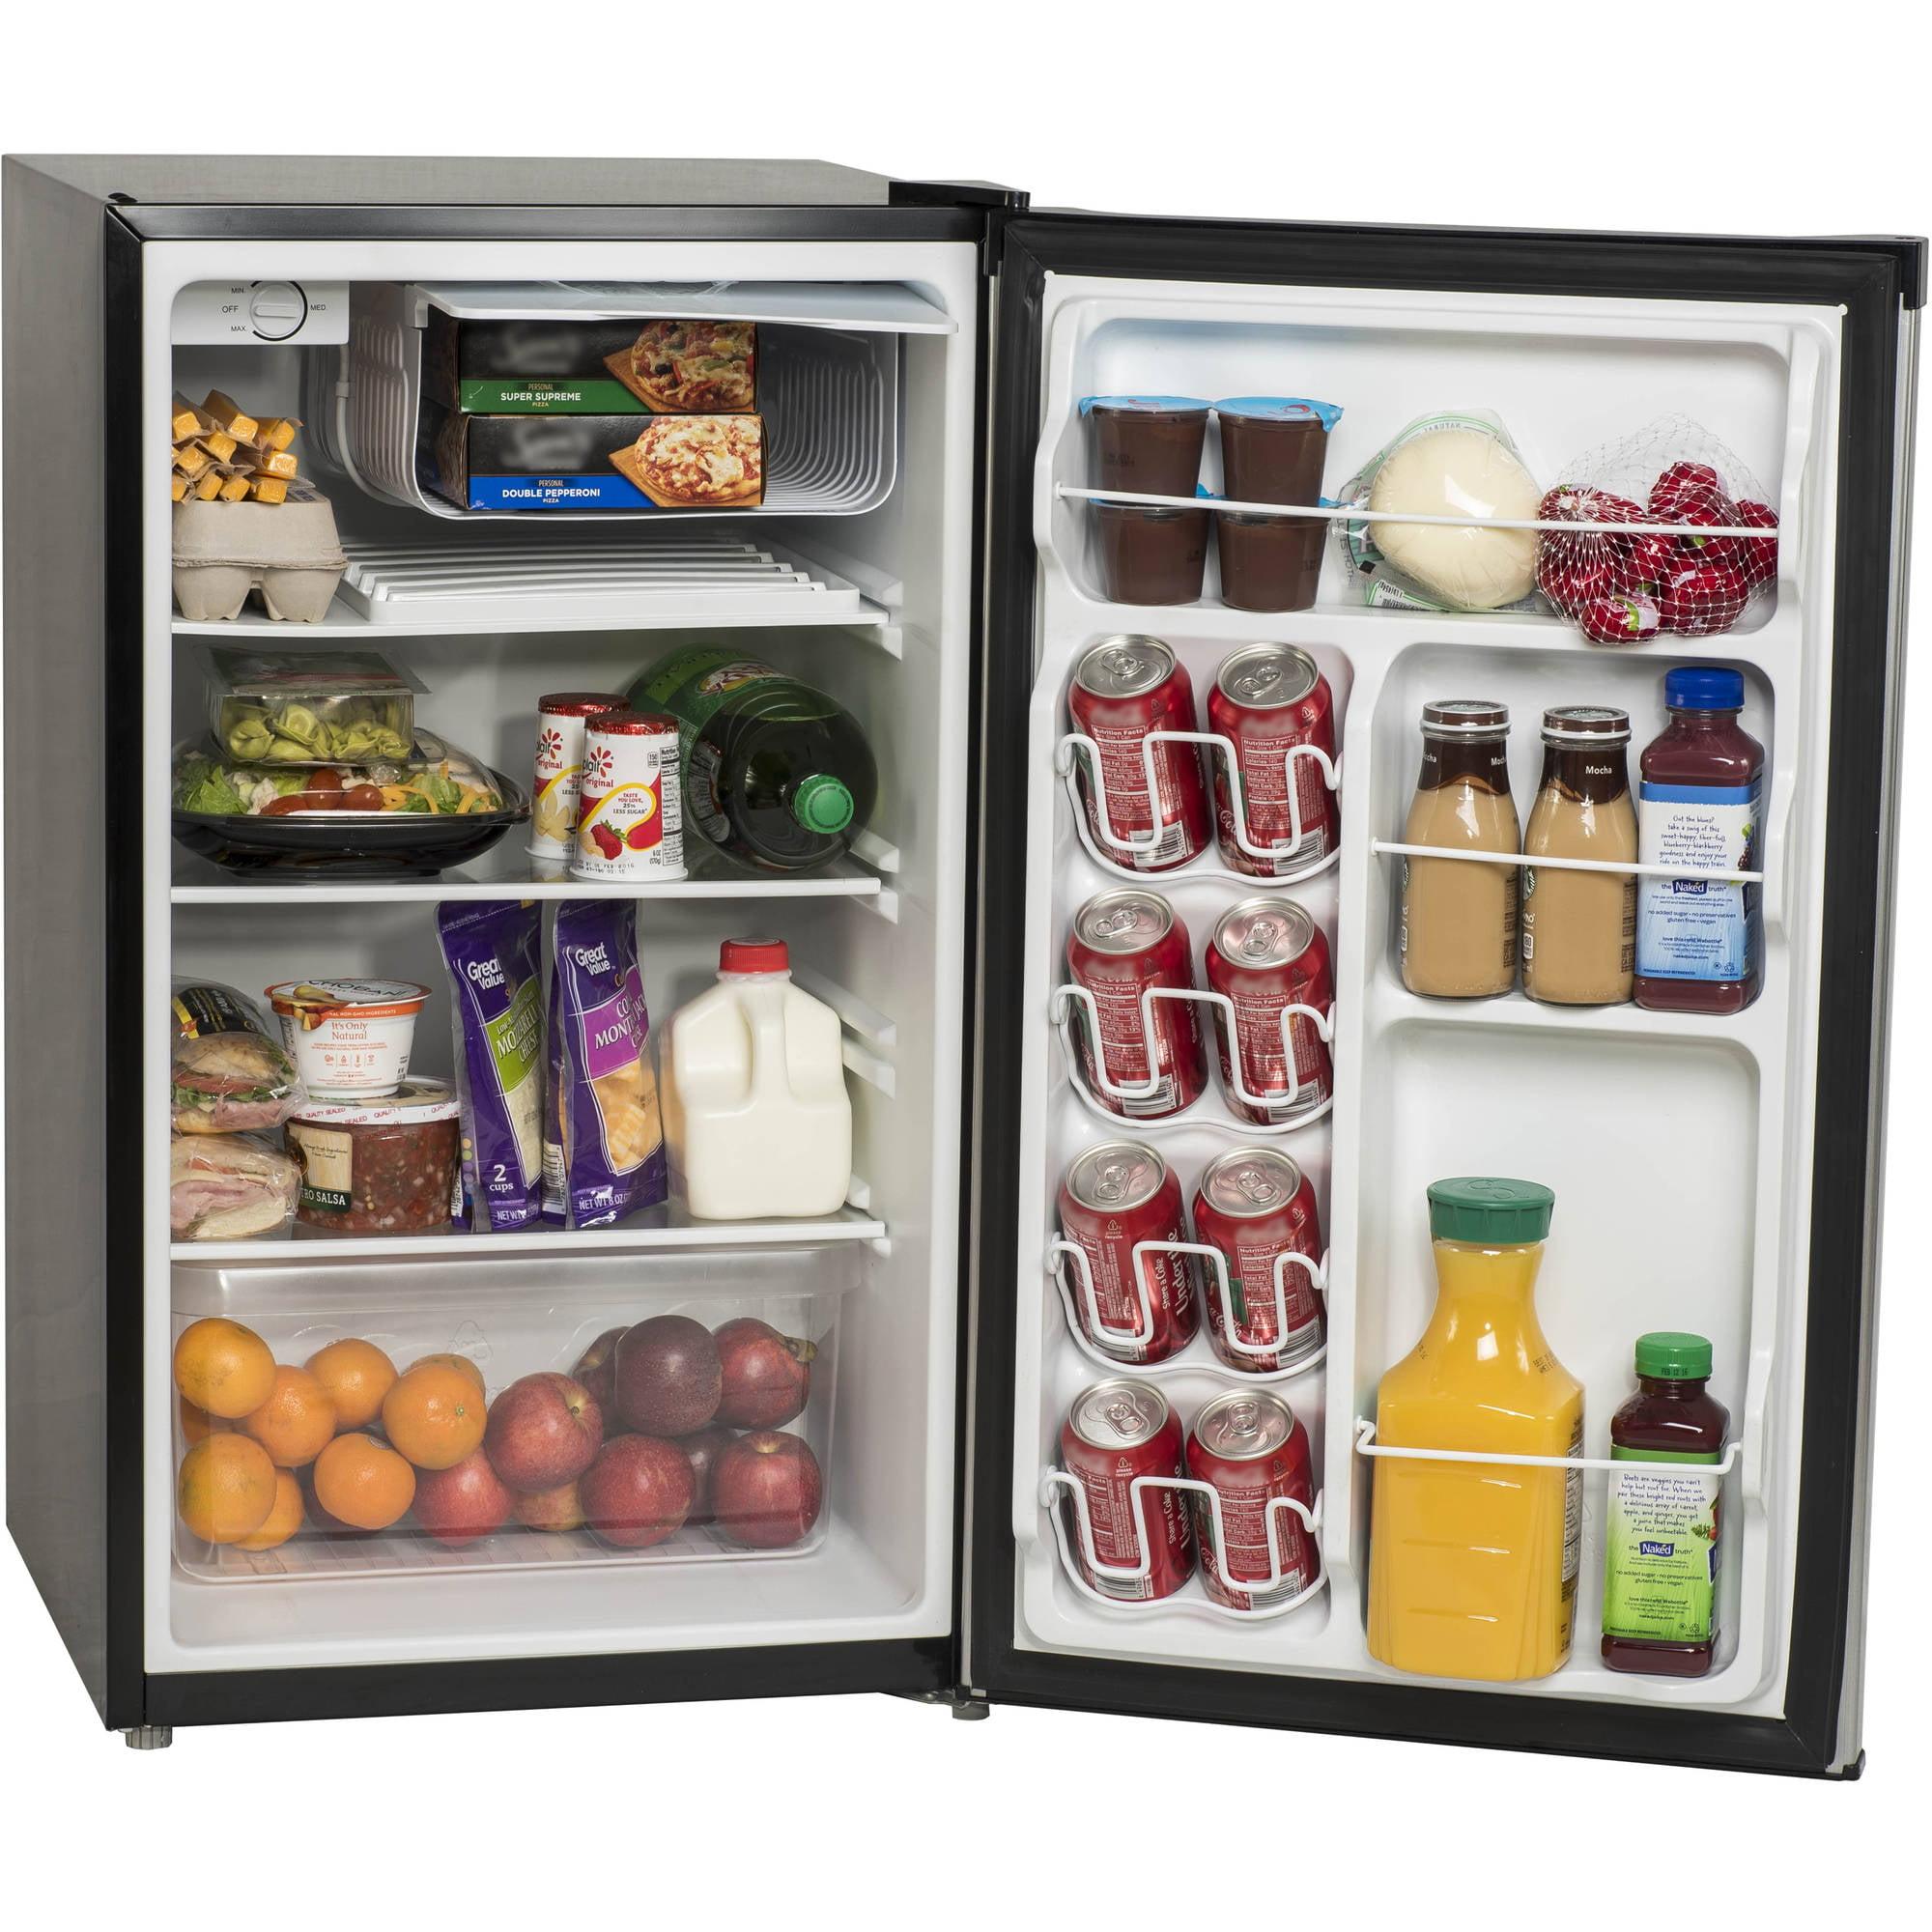 Superieur Arctic King 4.5 Cu Ft One Door Compact Refrigerator, Energy Star   Multiple  Colors   Walmart.com